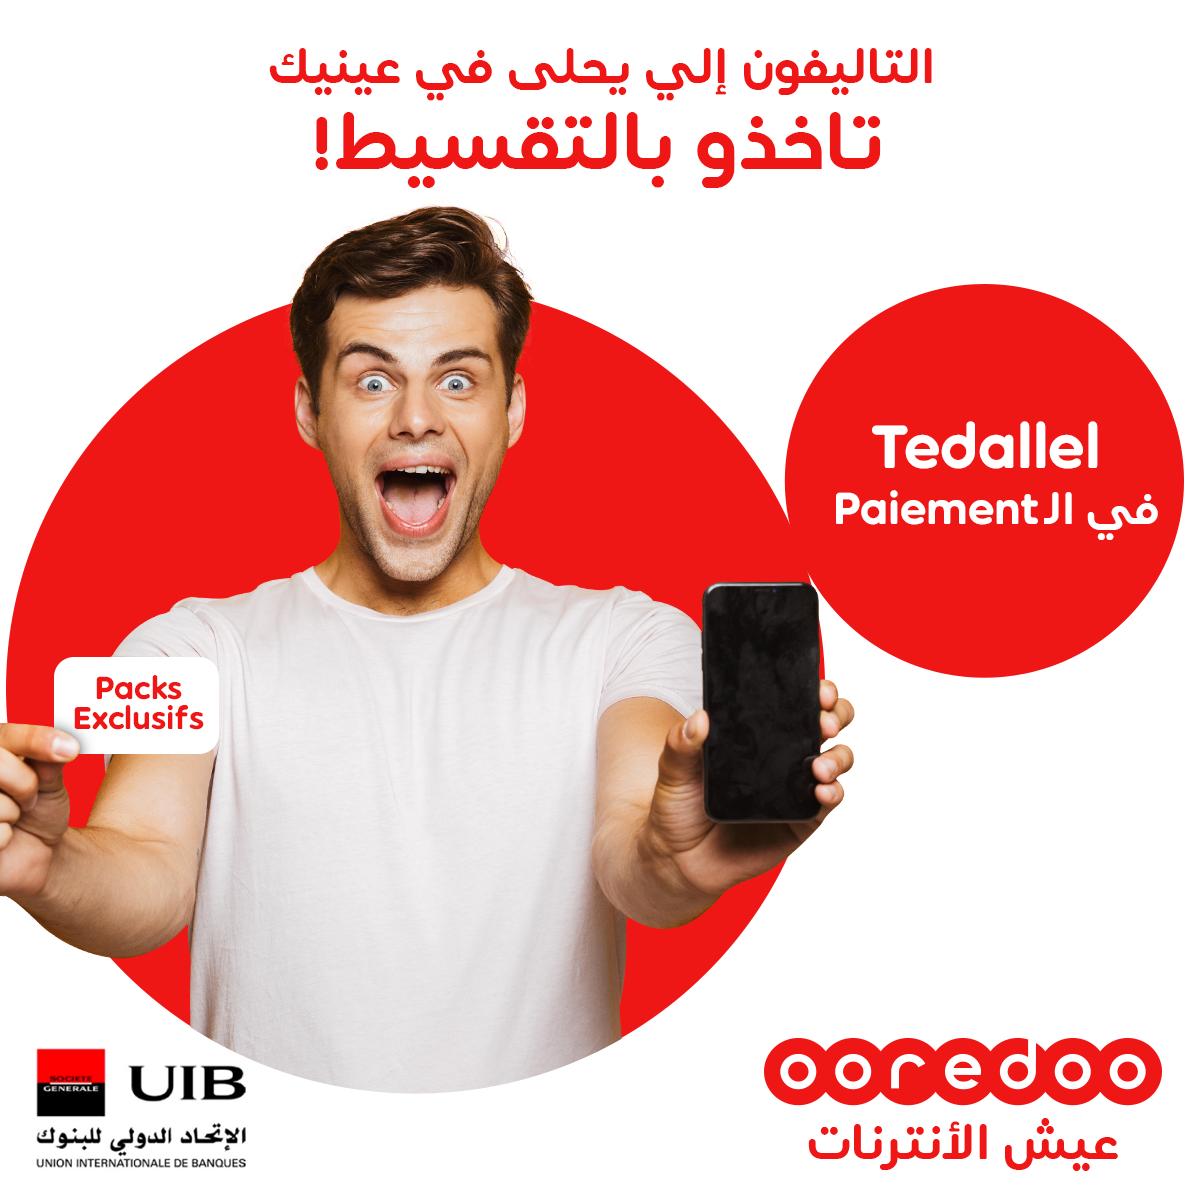 Ooredoo تمكن حرفائها من شراء هواتفهم الذكية  بالتقسيط عبر الانترنت بالا شتراك مع الاتحاد الدولي للبنوك UIB :